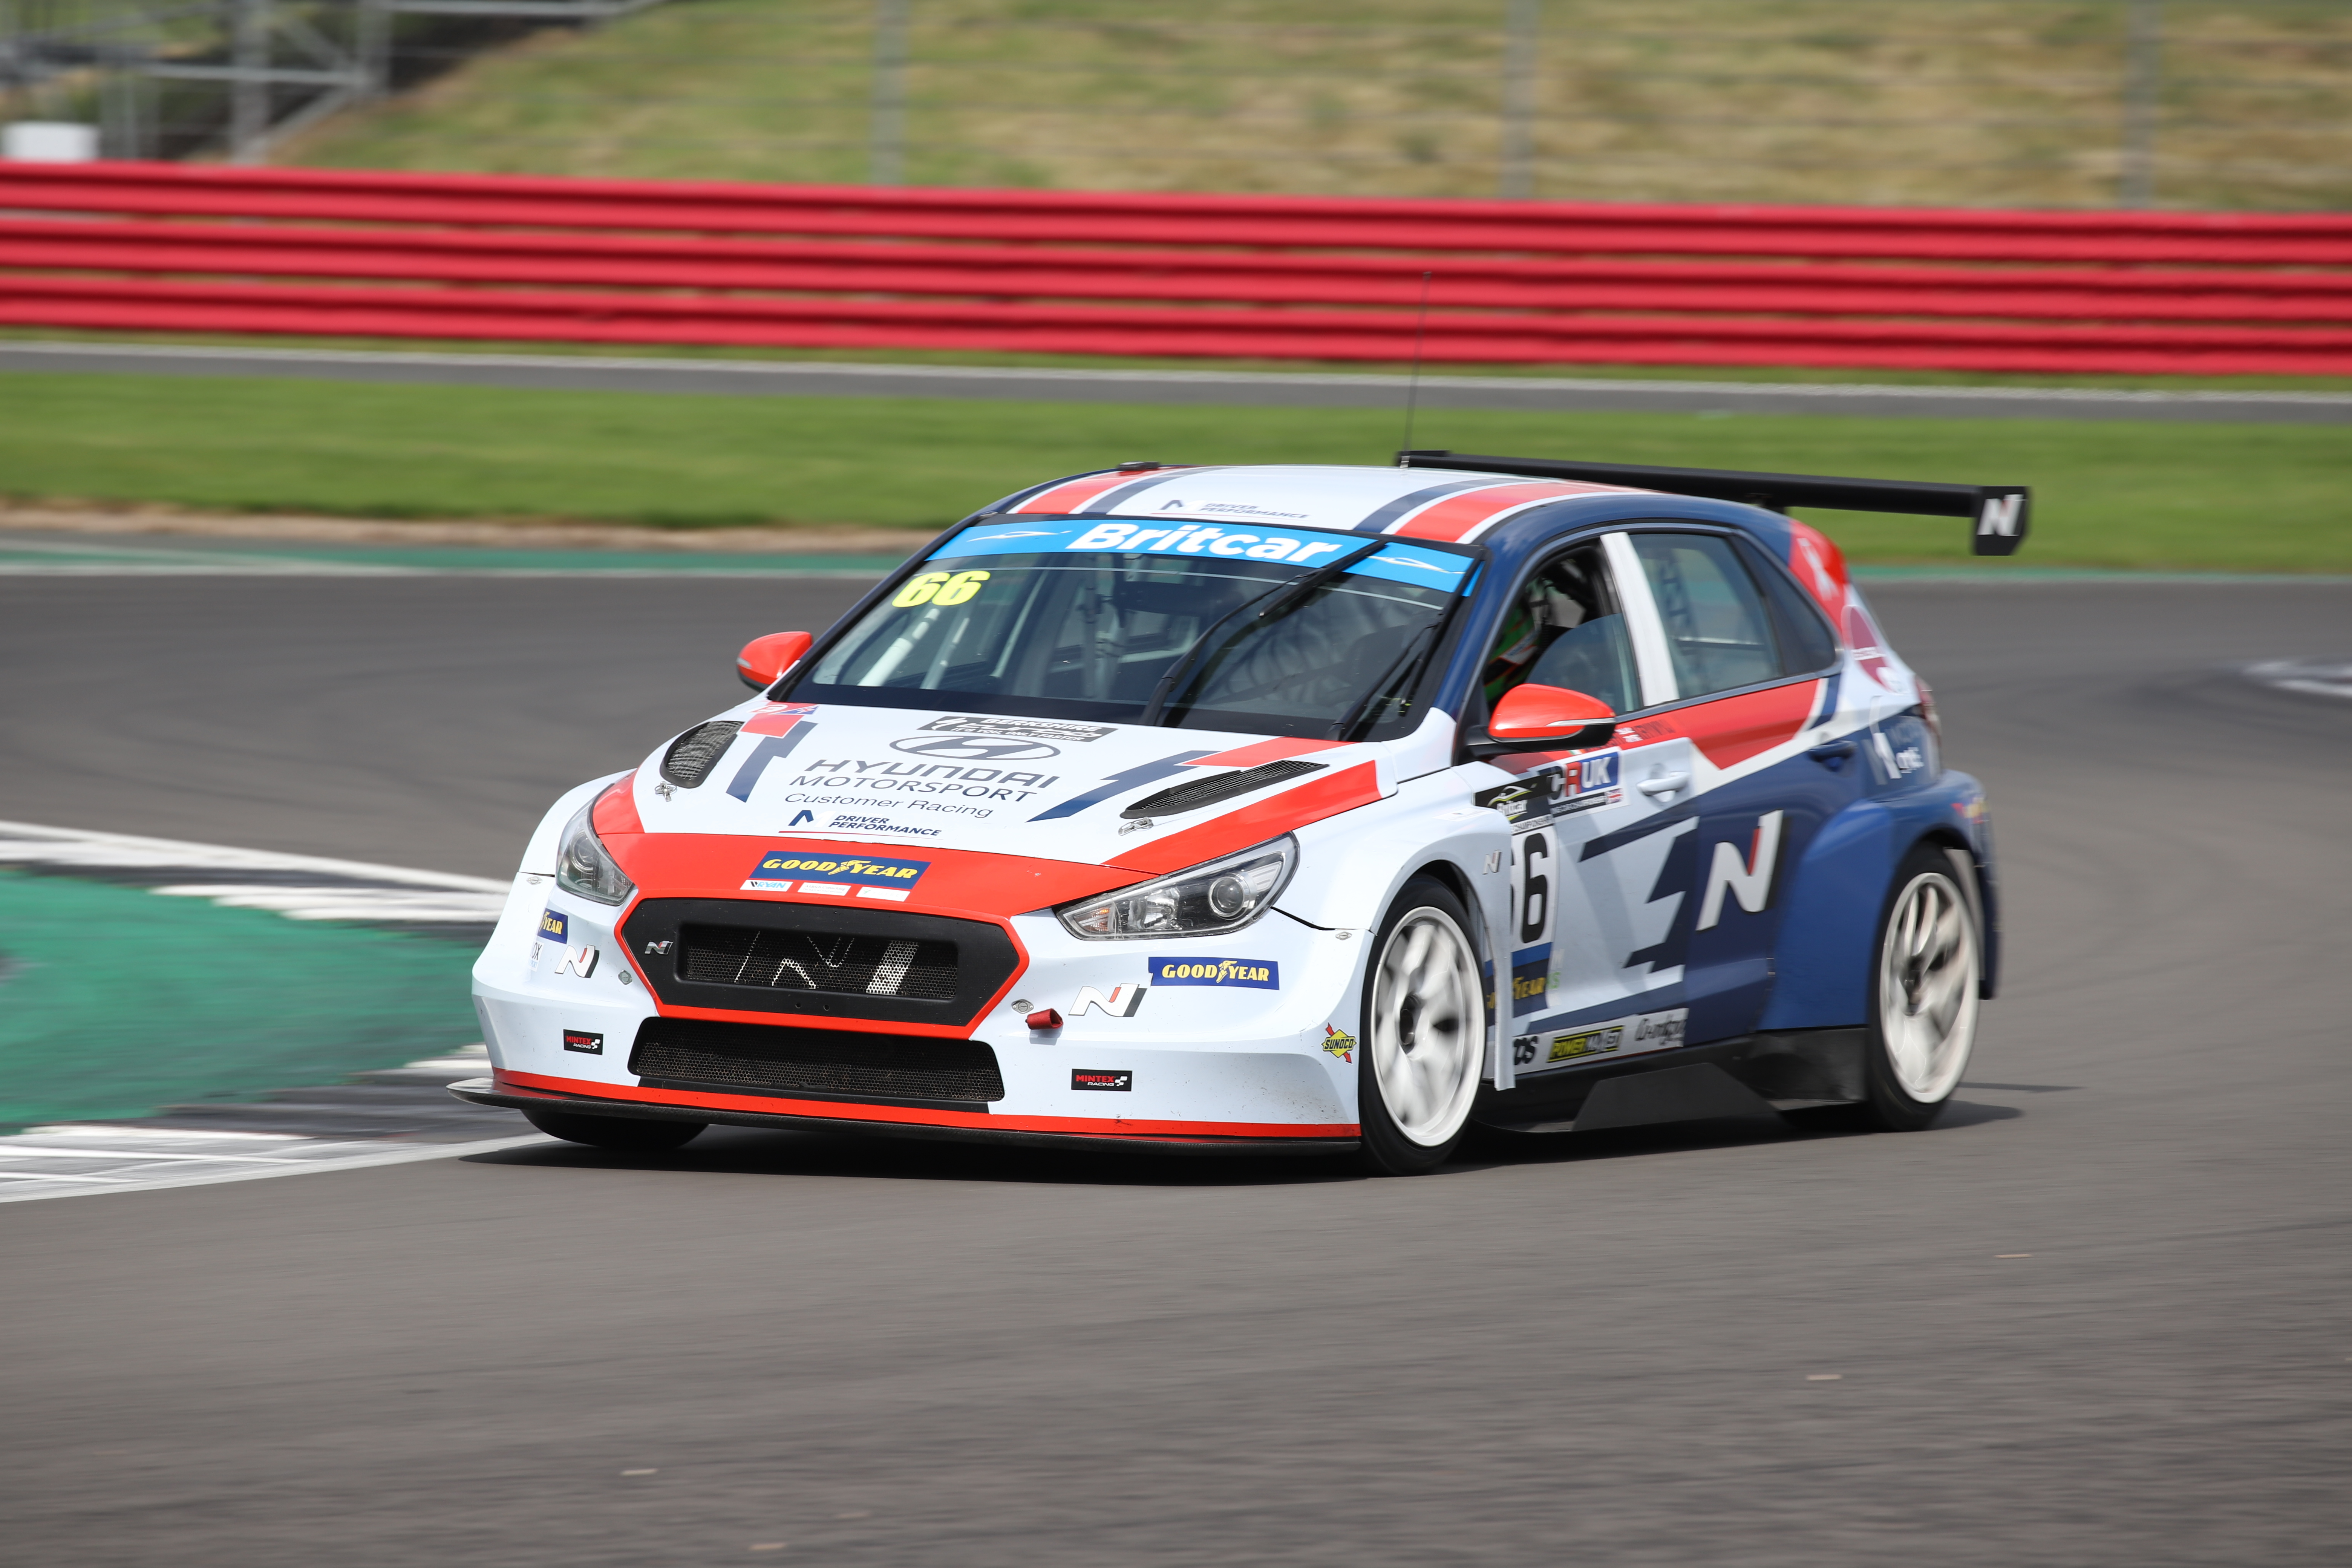 Nicole Drought/Danny Krywyj - Hyundai i30 N TCR - Silverstone. Photo: Chris Valentine